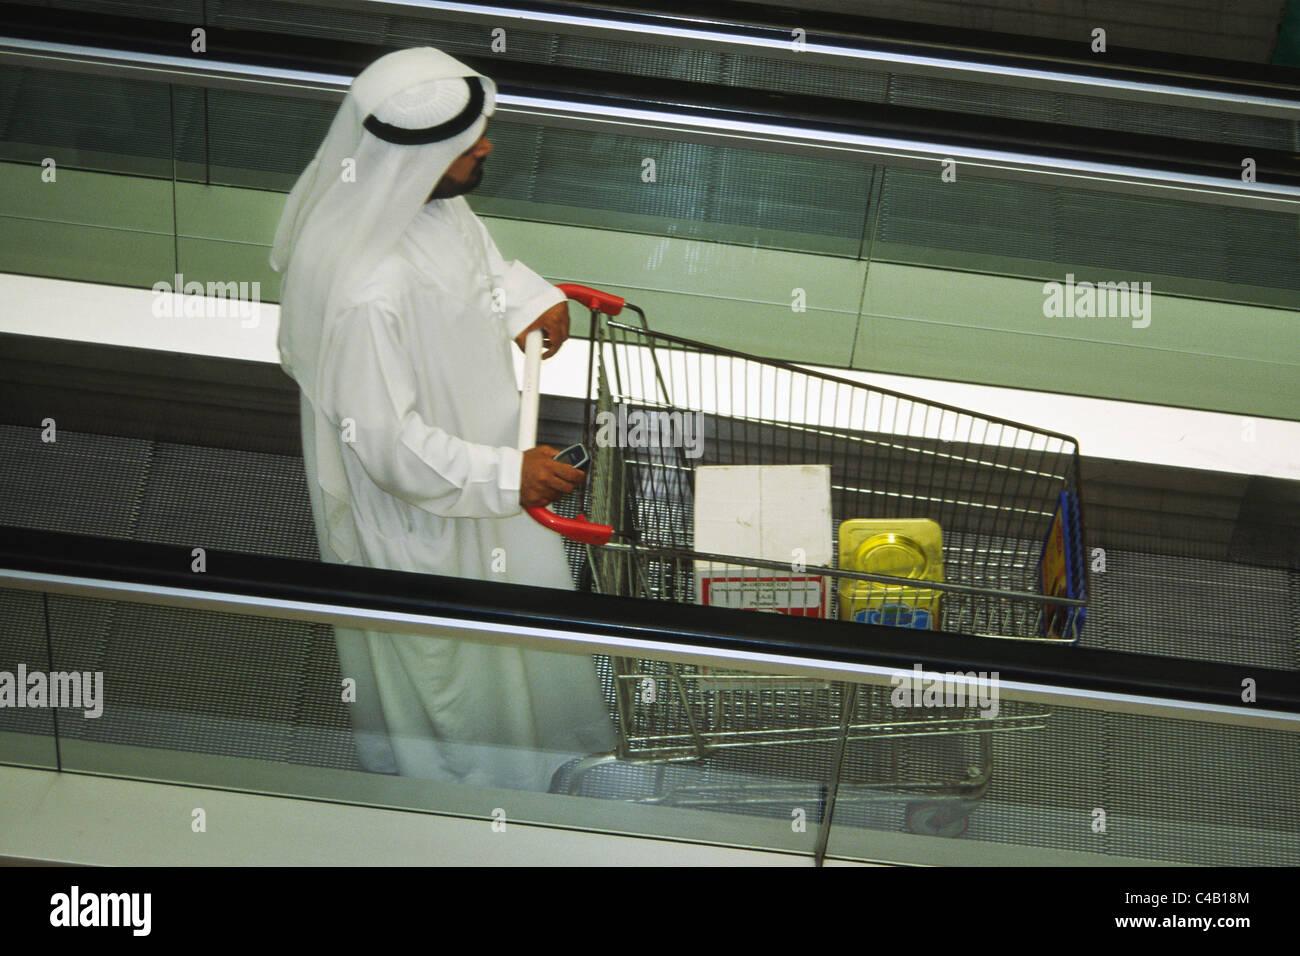 Local arab shopper in the supermarket in Dubai, United Arab Emirates. - Stock Image